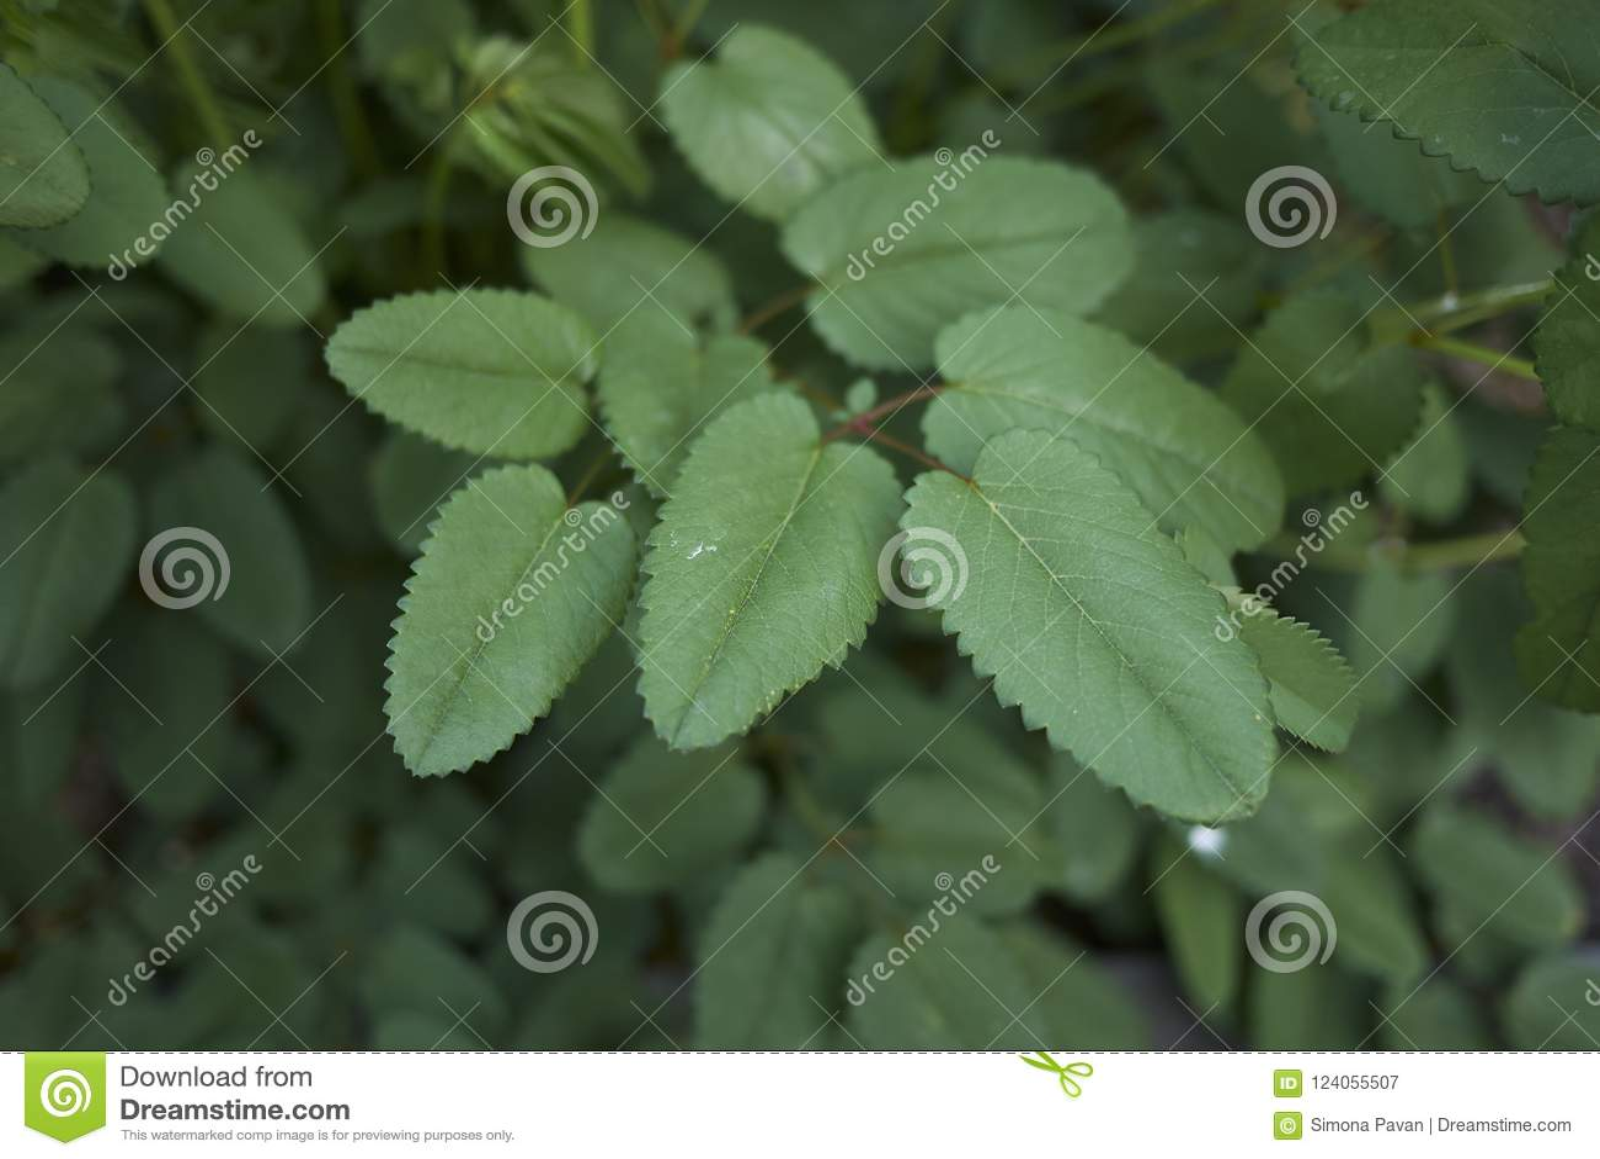 Leaves close up of Sanguisorba officinalis